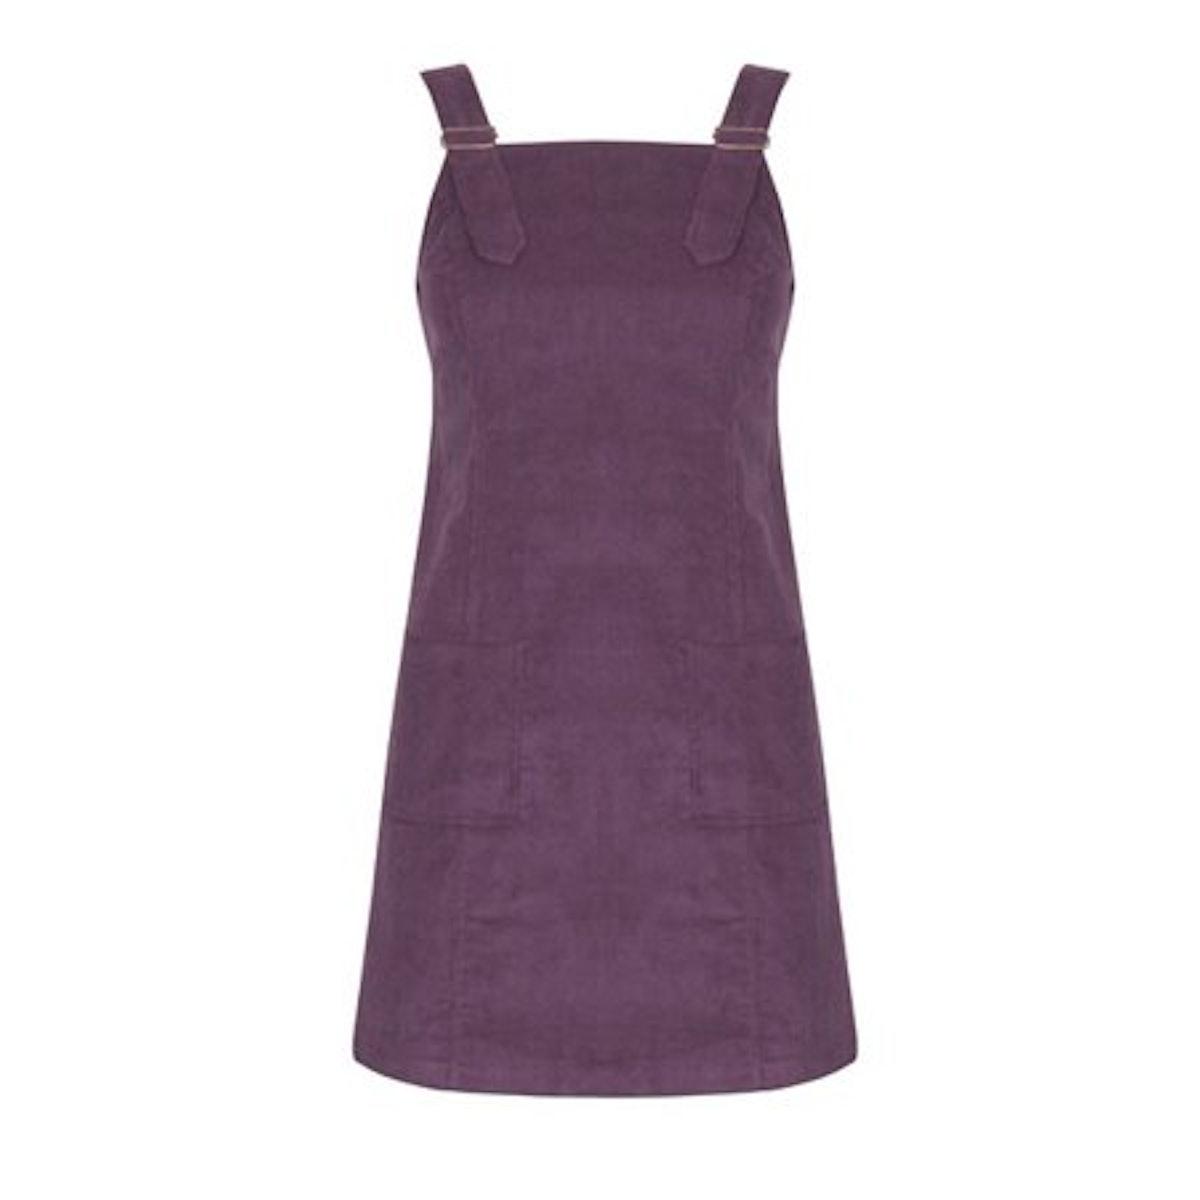 Celmia Straight Suspender Strap Corduroy Mini Dress